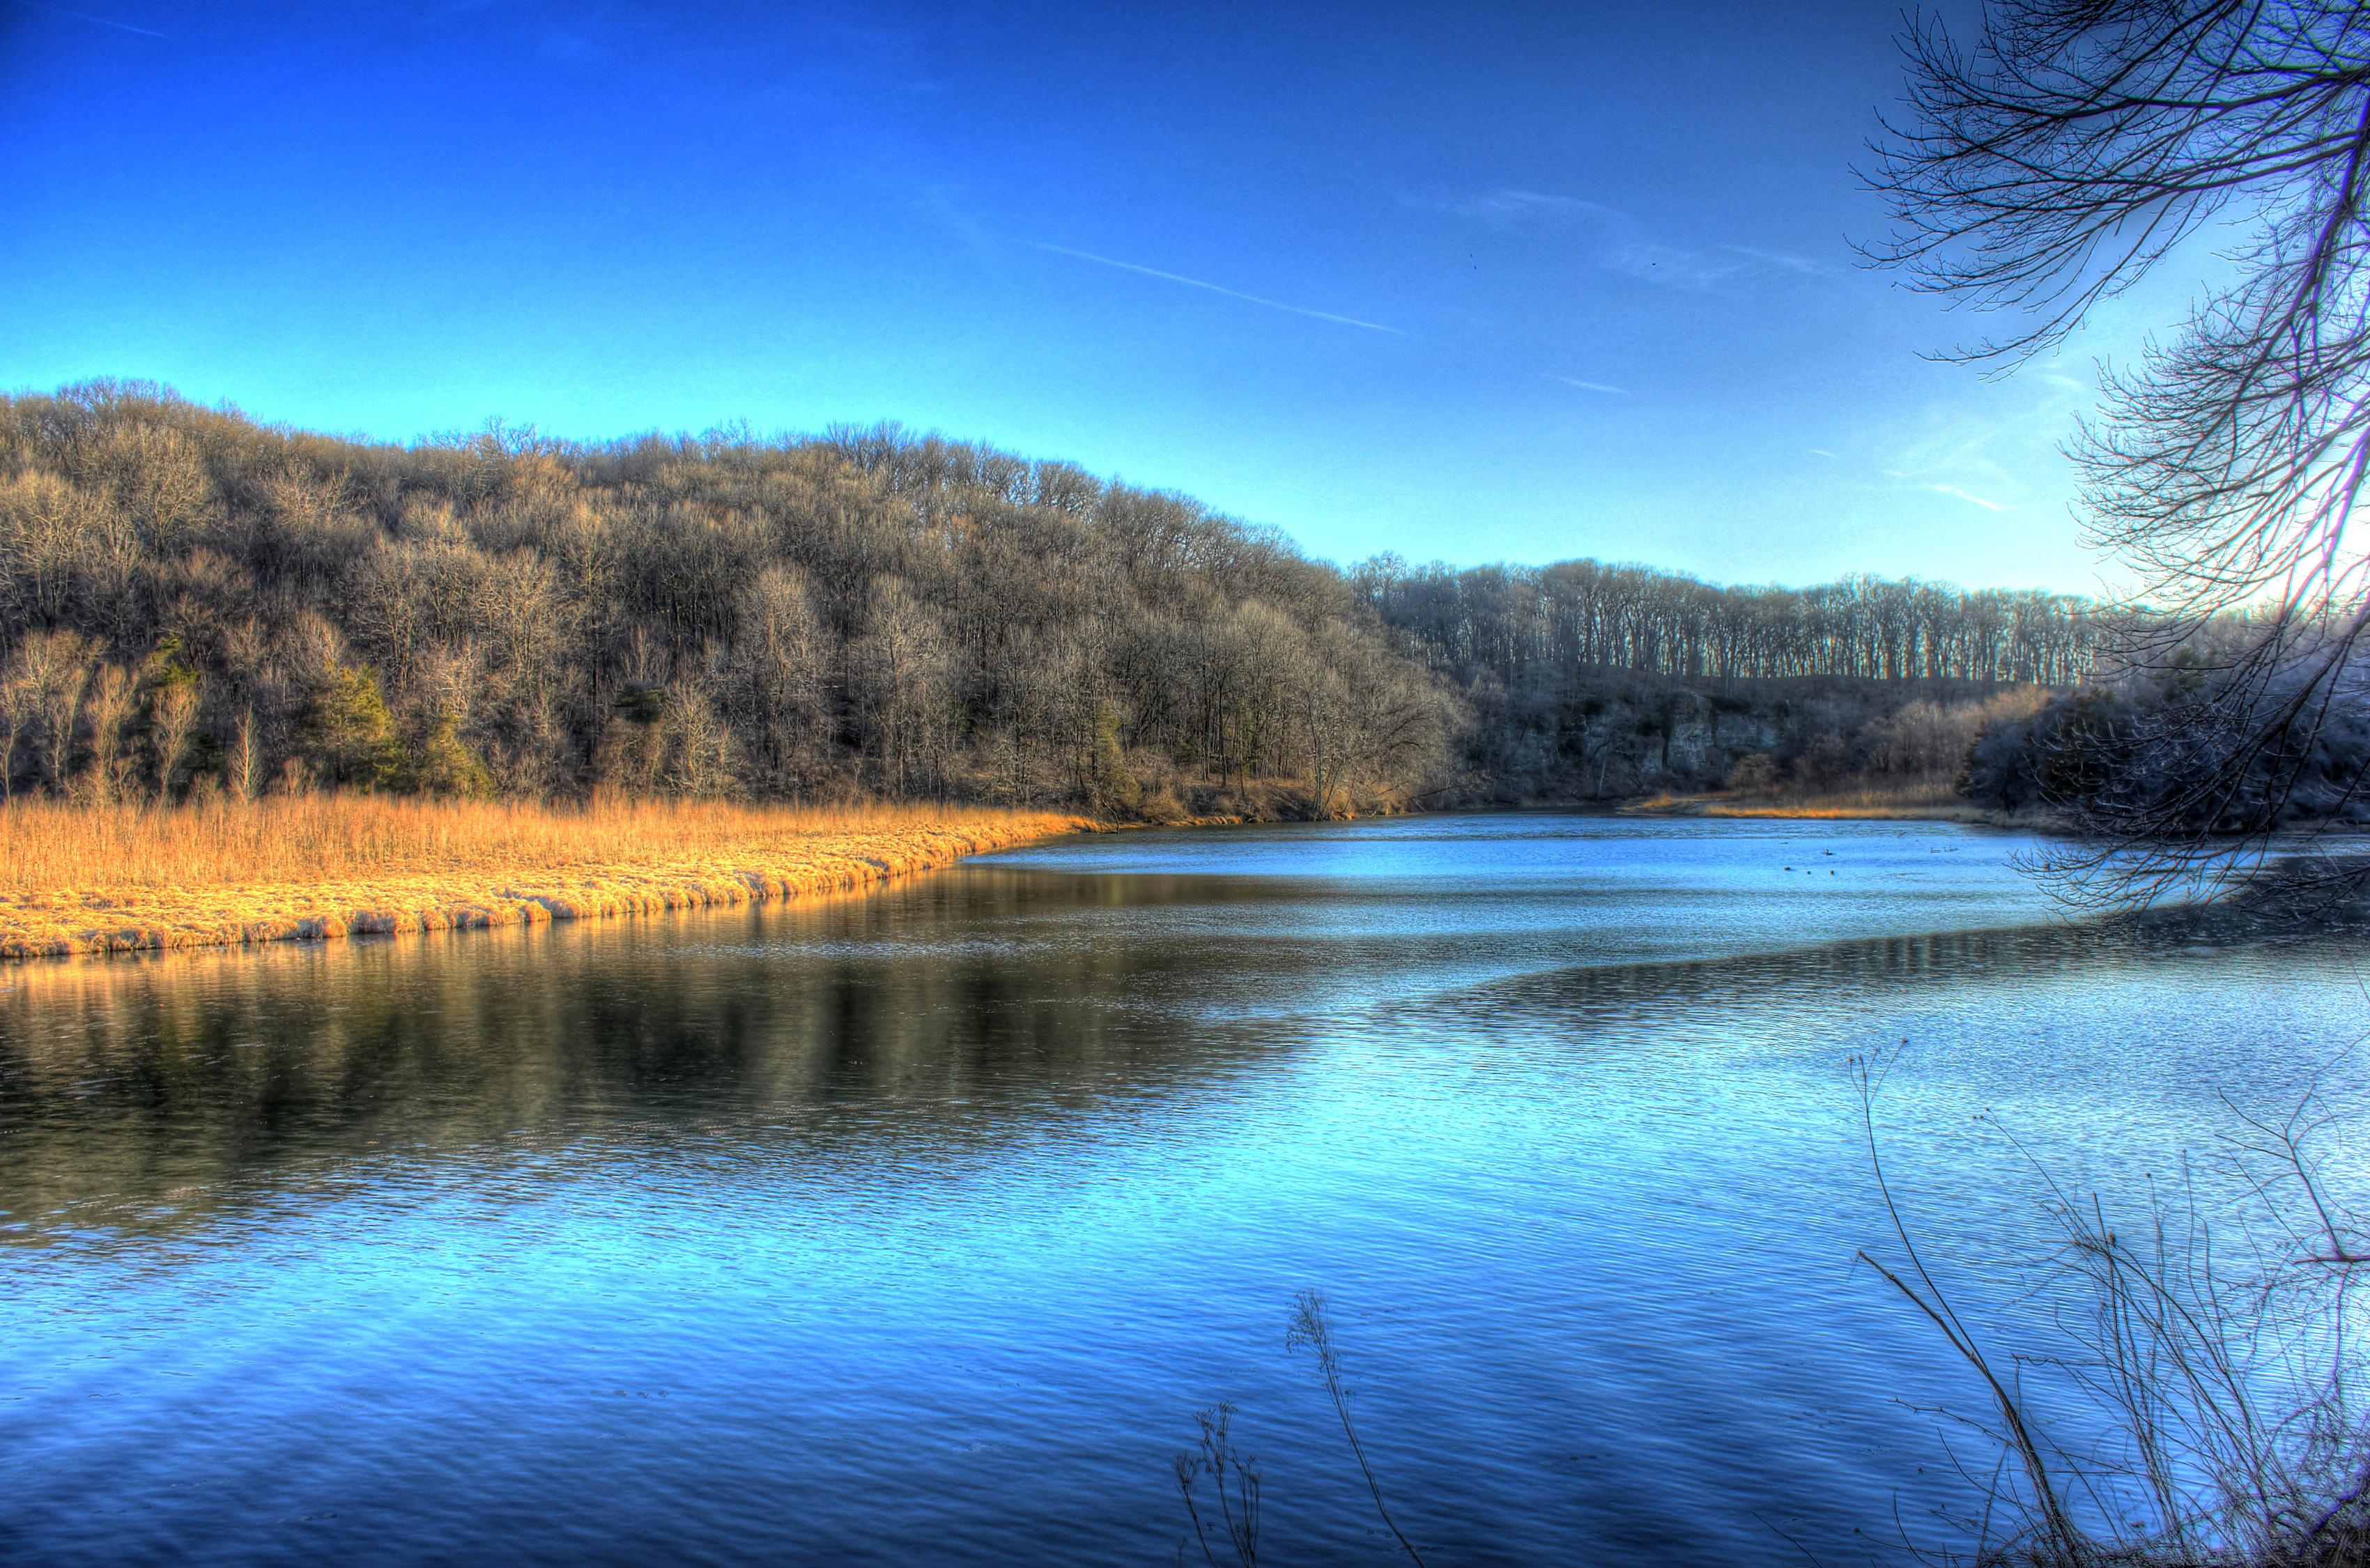 Beautiful Fall Hd Wallpaper Scenic River Landscape At Backbone State Park Iowa Image